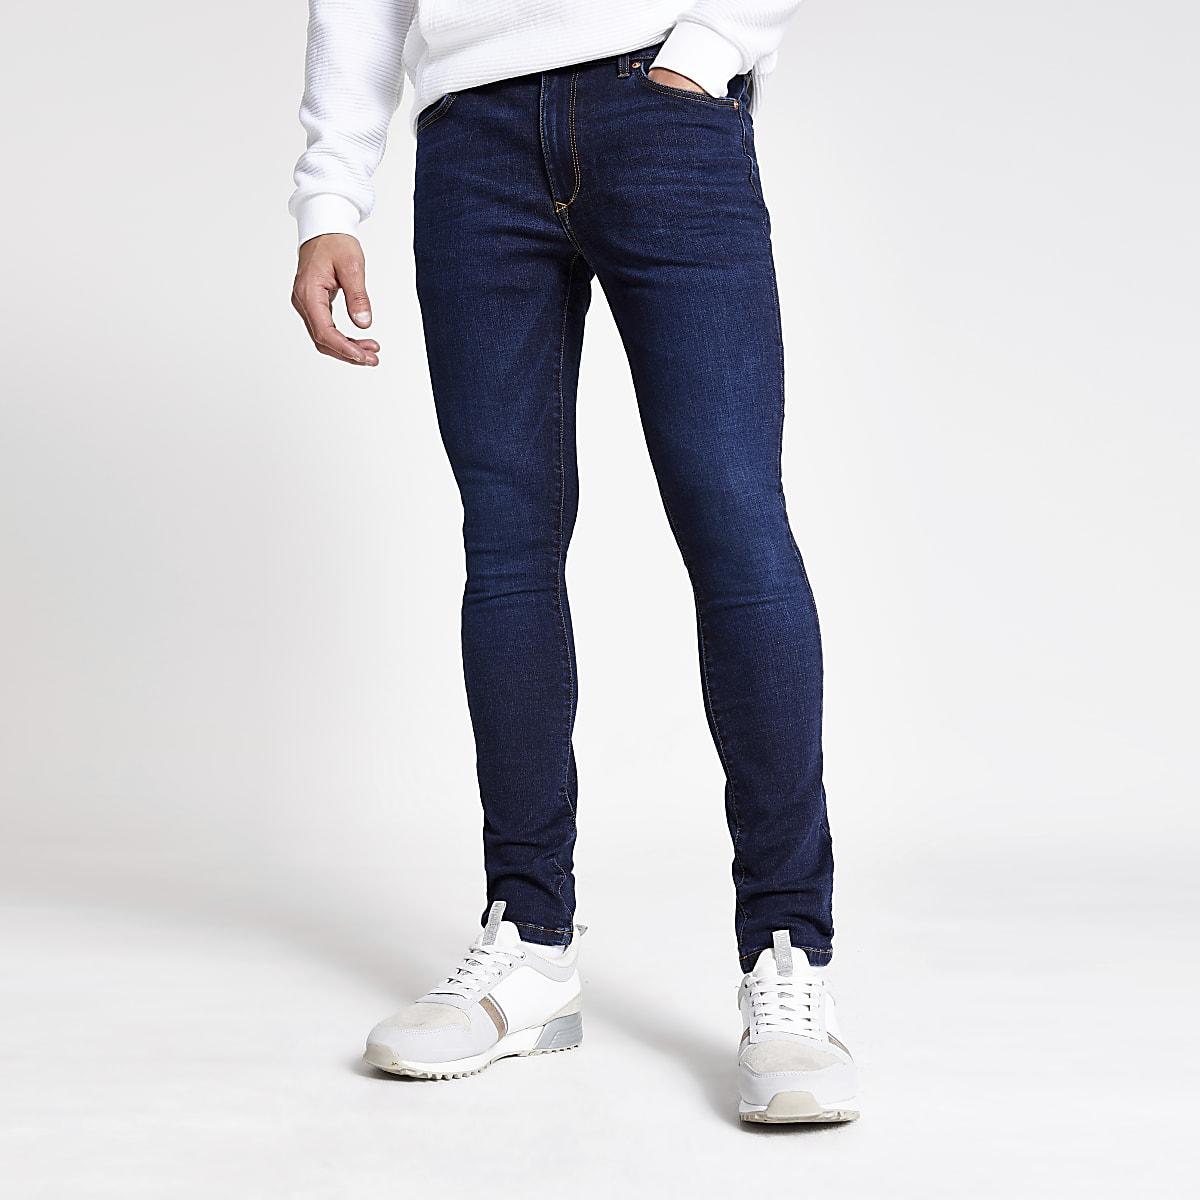 Danny - Donkerblauwe superskinny jeans